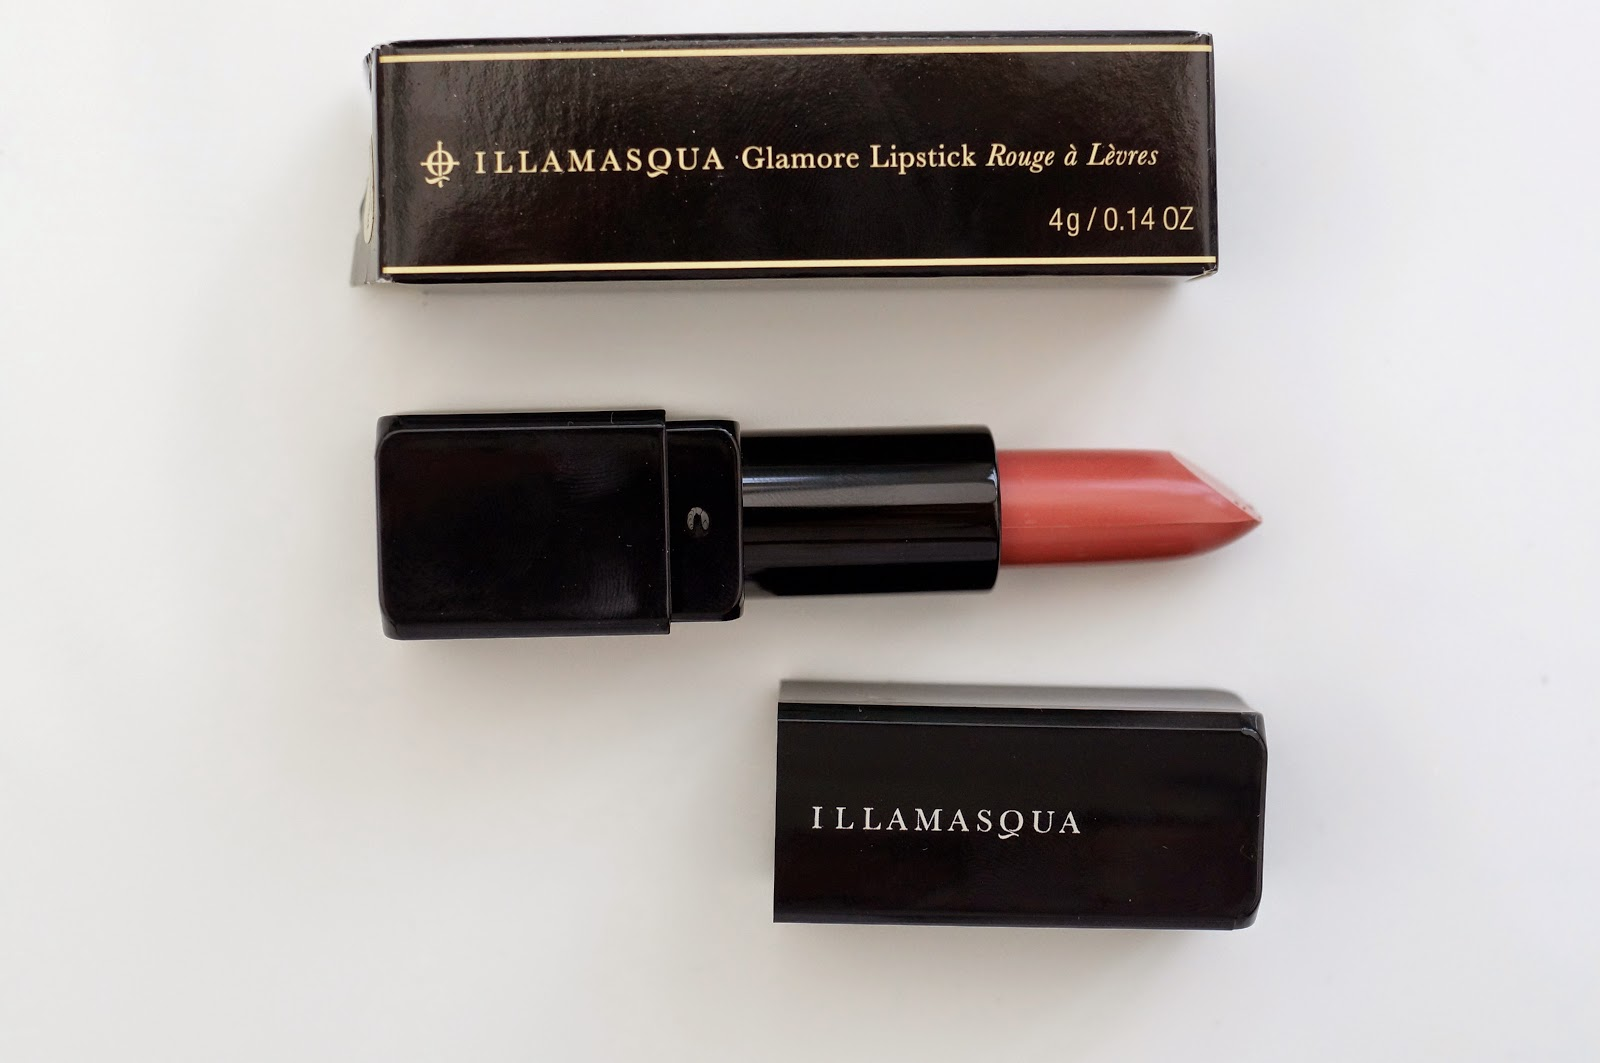 illamasqua glamore lipstick nude